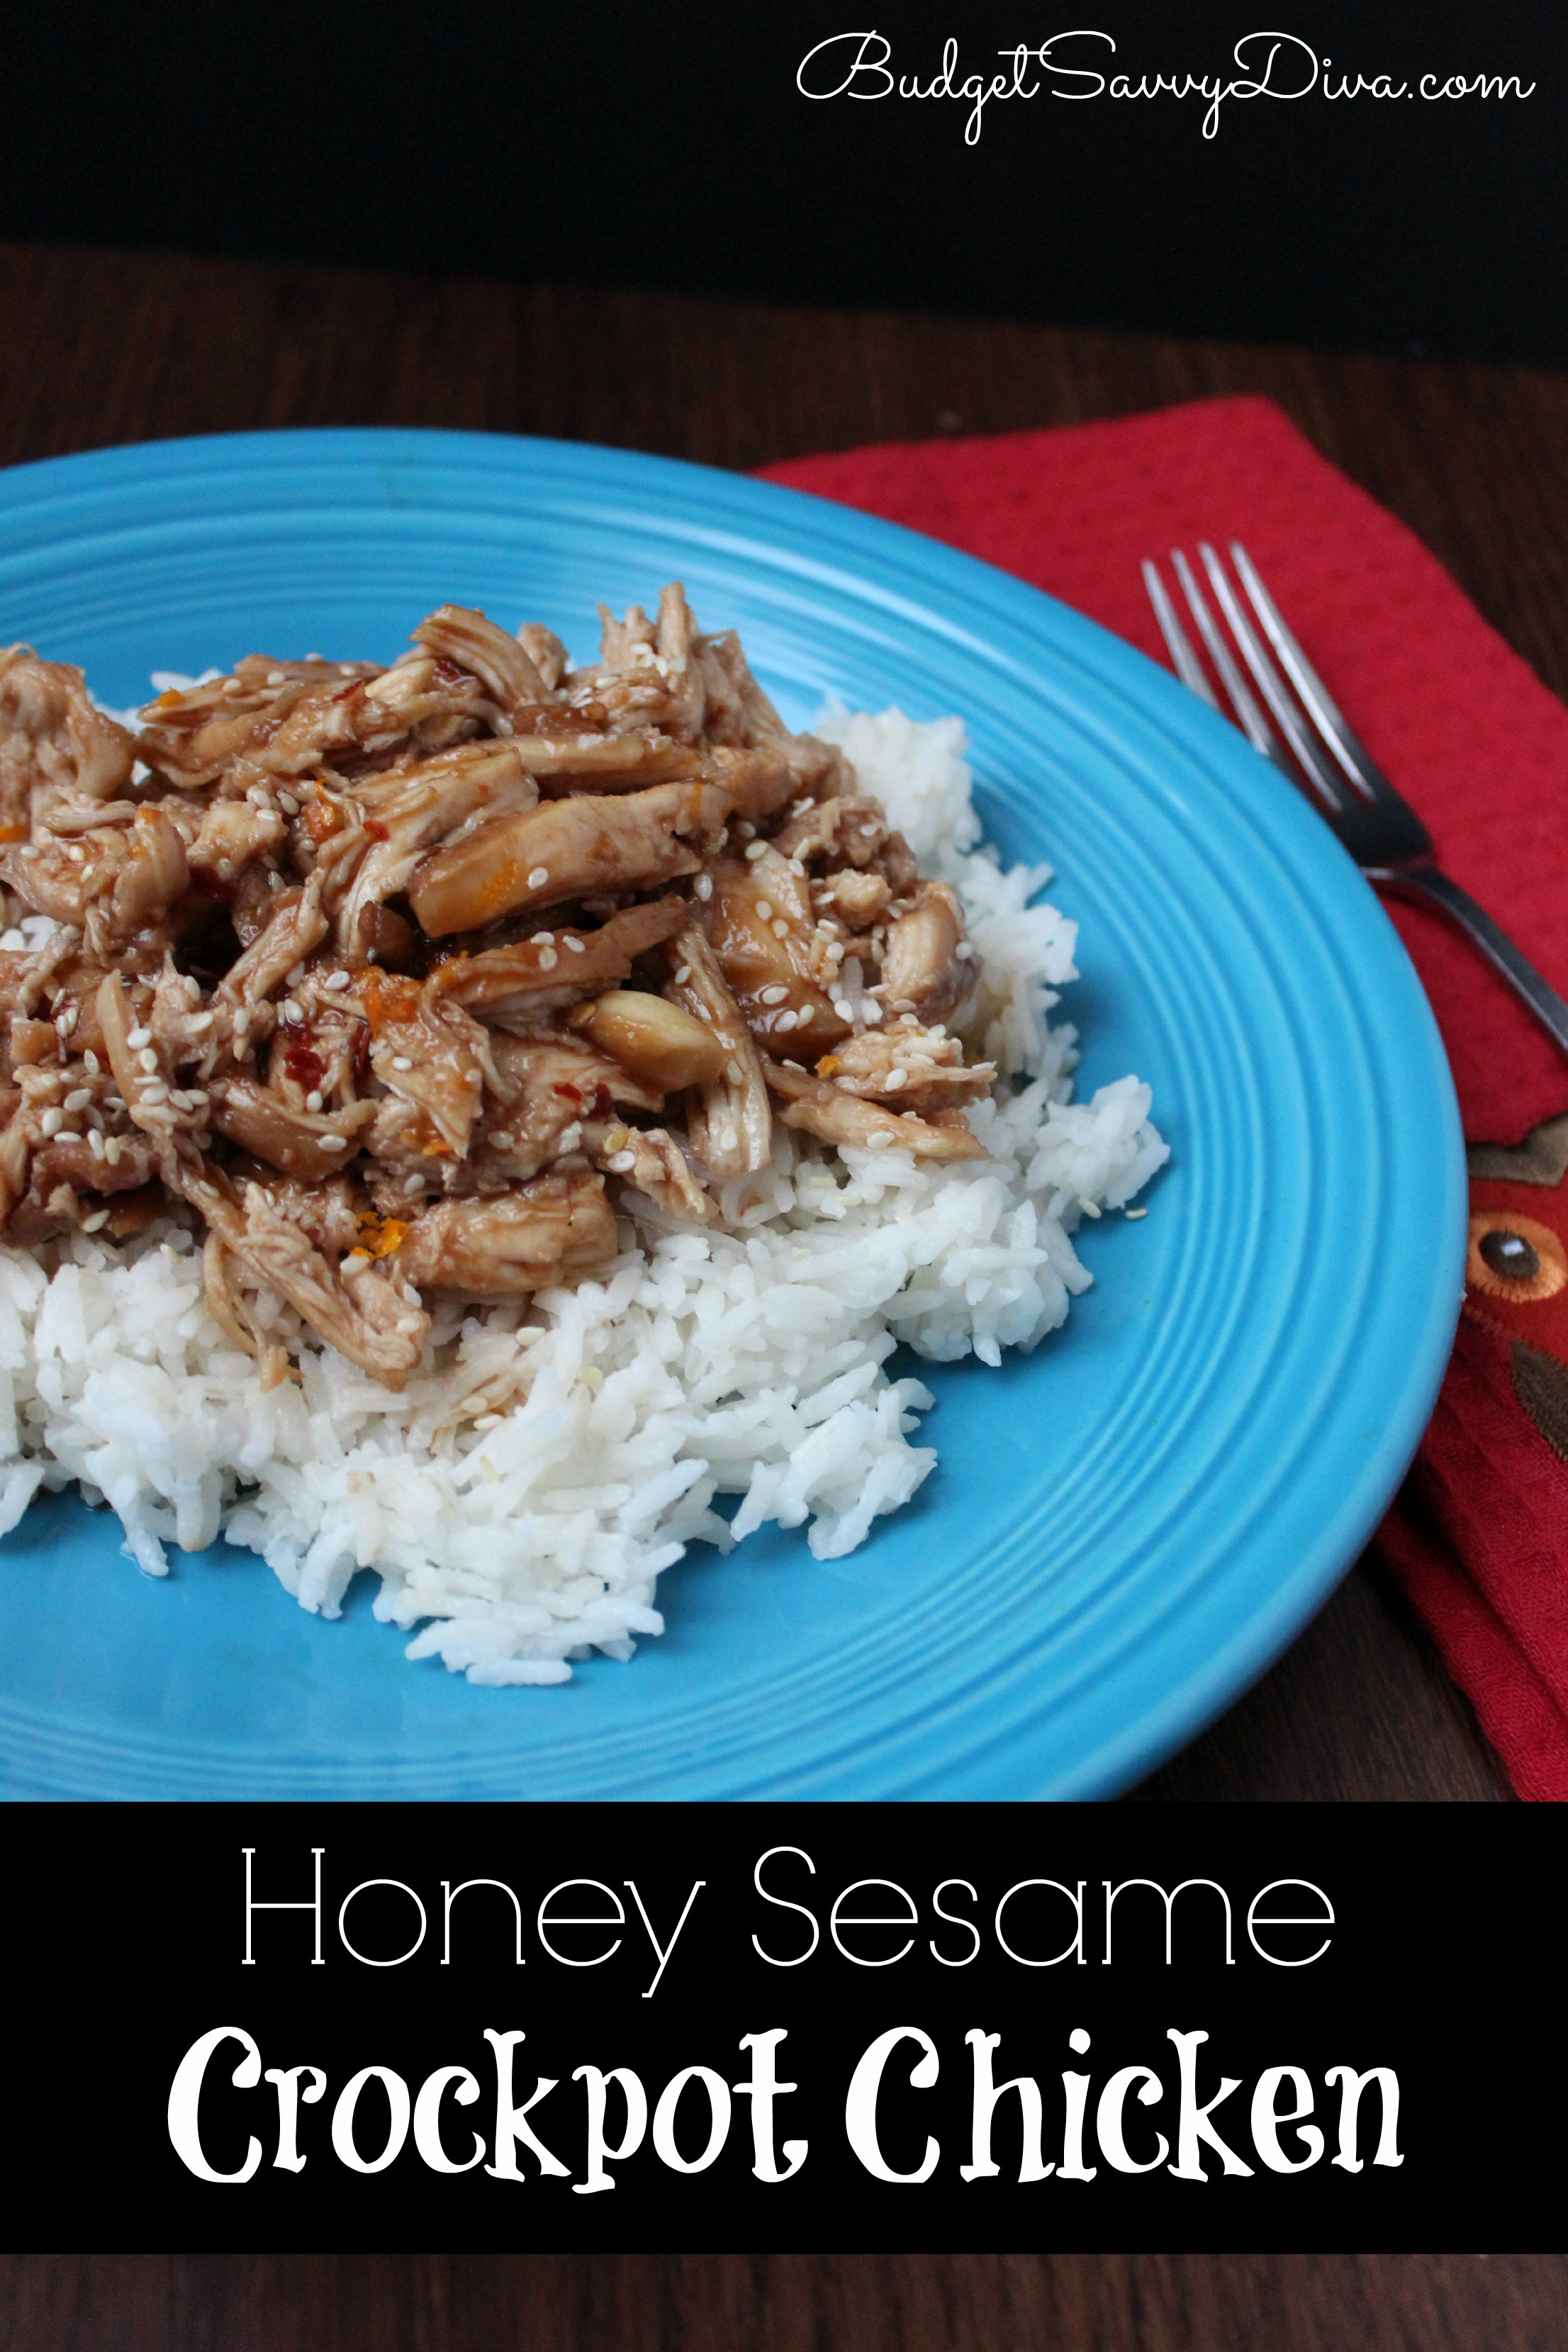 Honey Sesame Crockpot Chicken Recipe